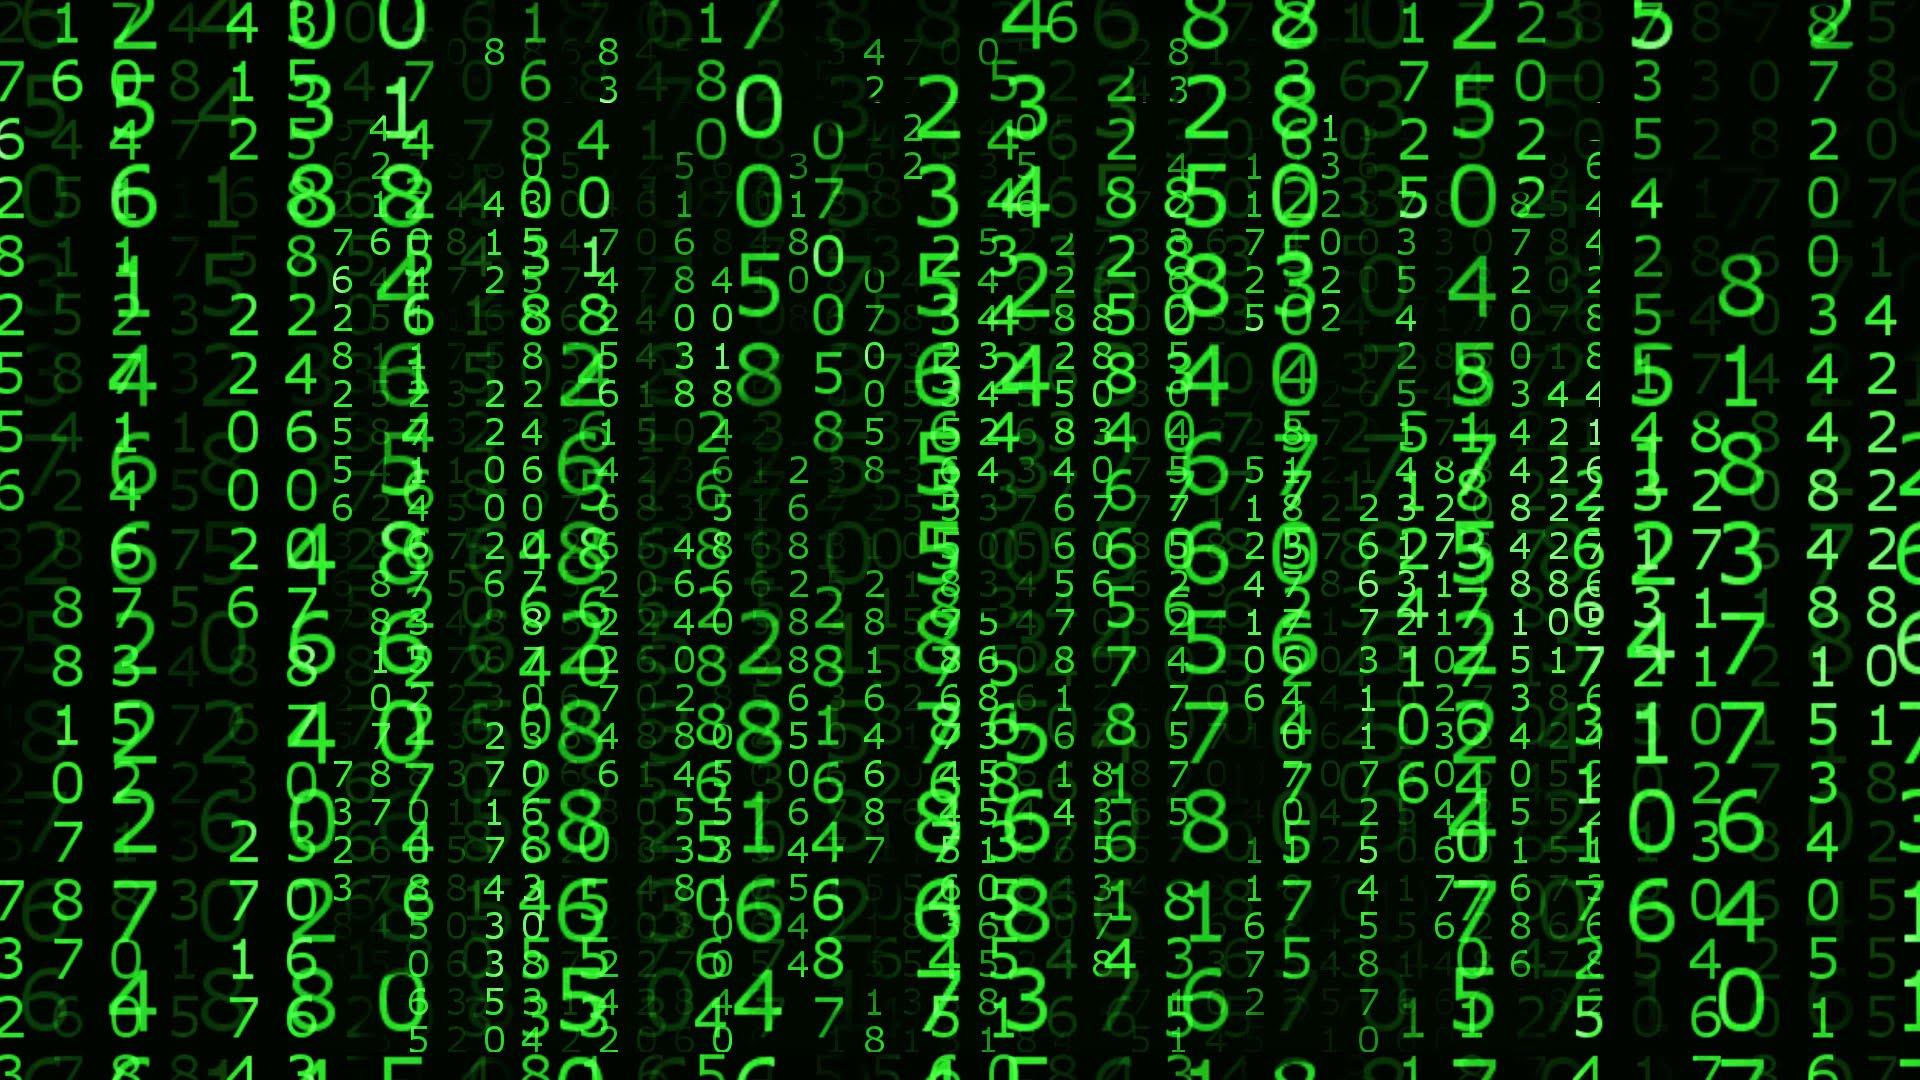 The Matrix Number Falling Code HD Bacground 1920x1080